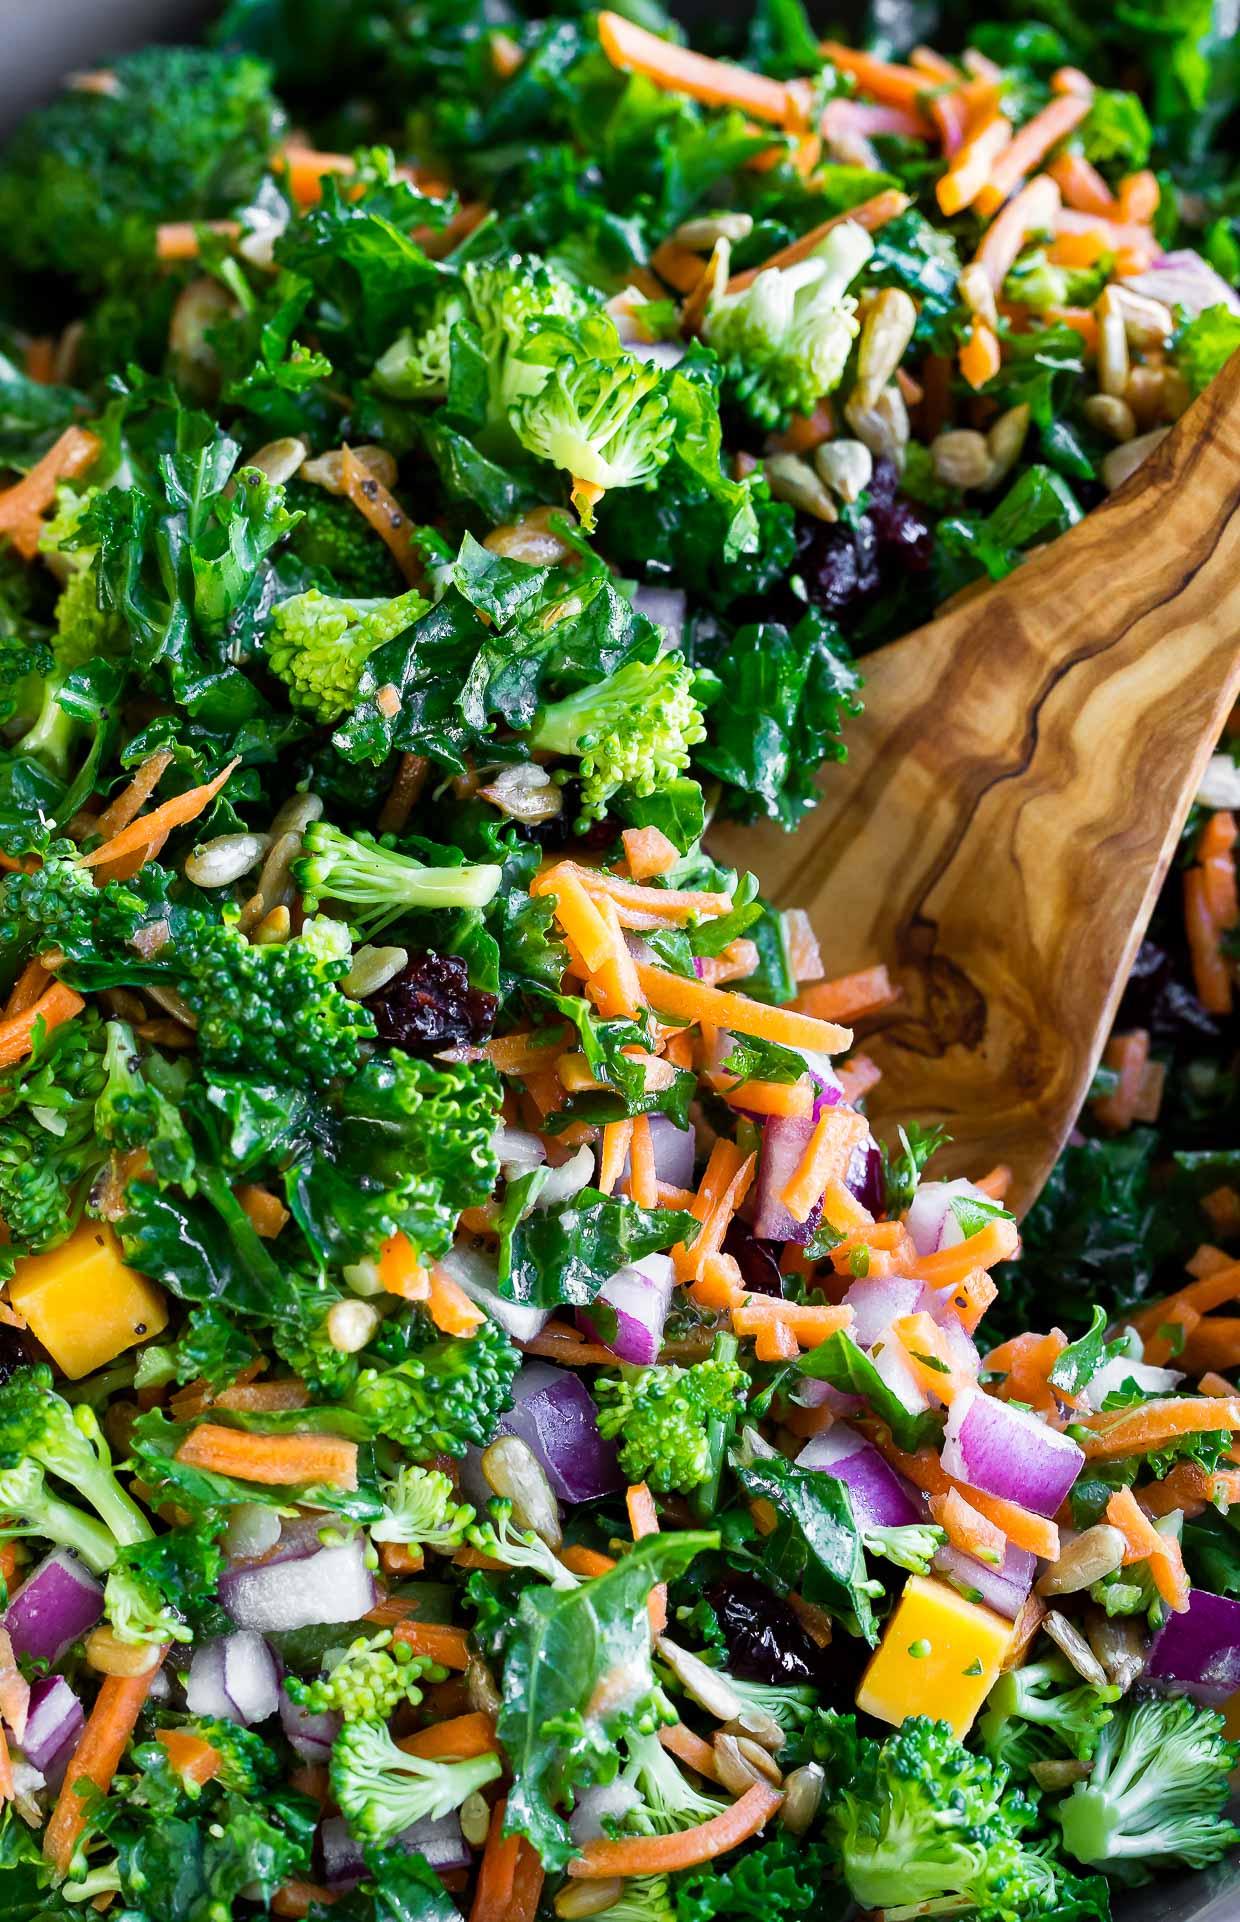 Broccoli Kale Salad with Lemon Dressing - Peas And Crayons Broccoli Kale Salad with Lemon Dressing